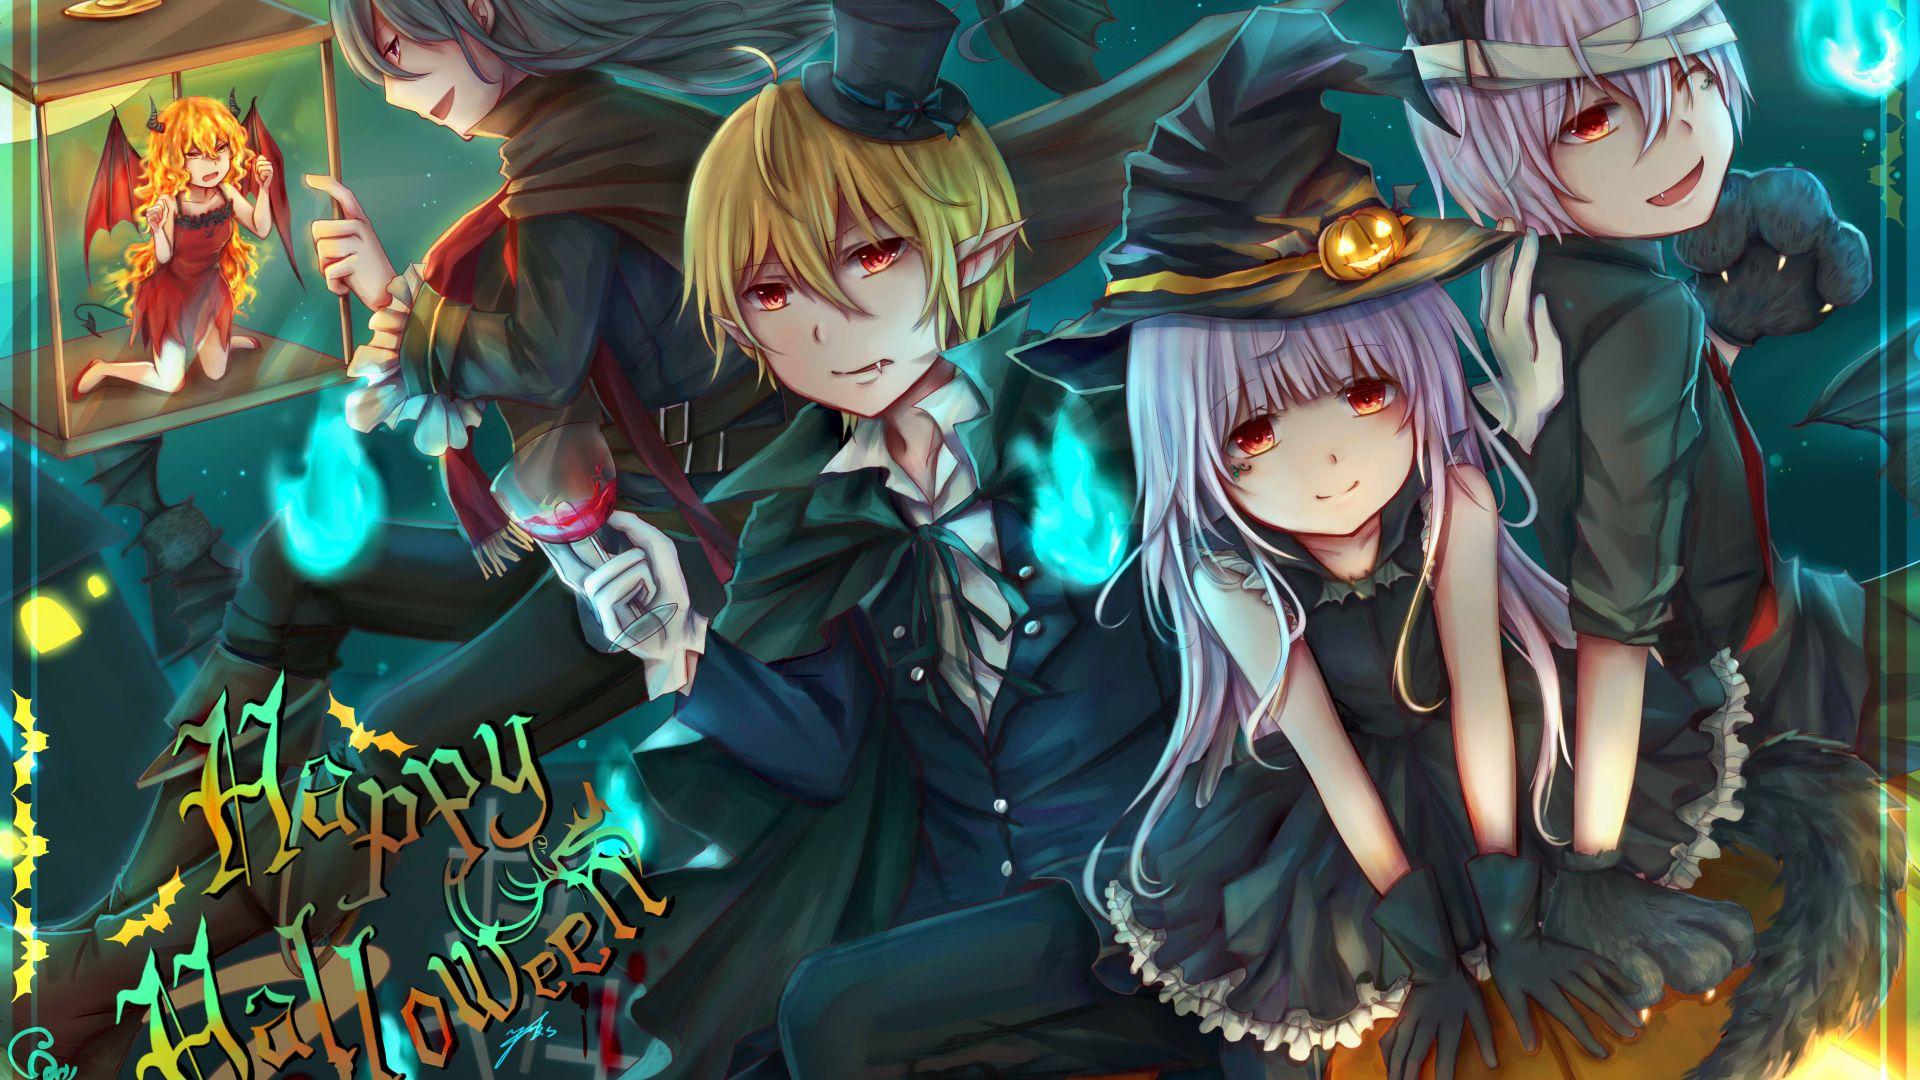 Wallpaper Anime, halloween, anime girls and boys, friends, 4k